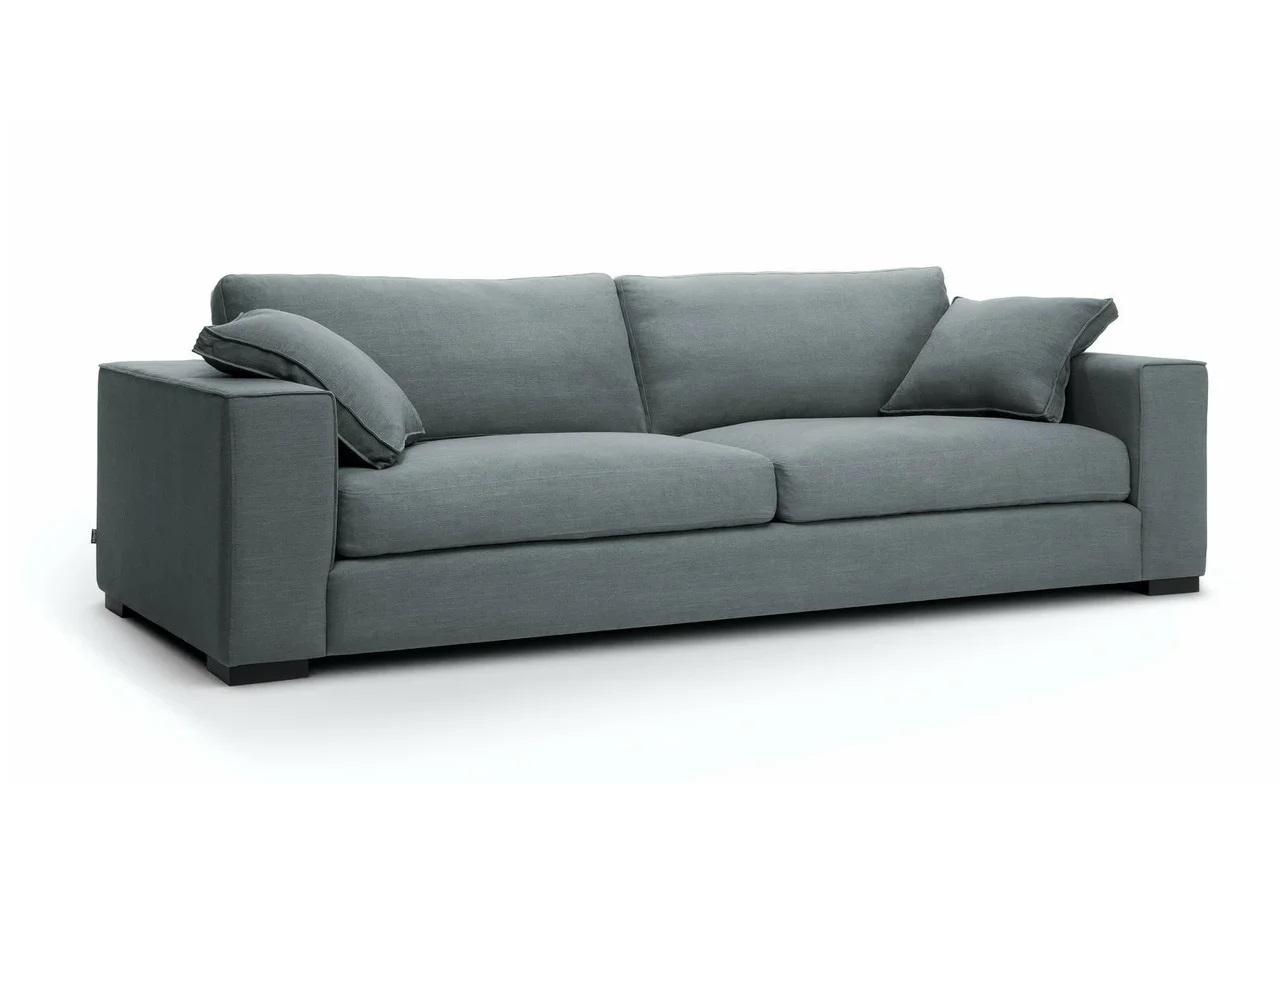 Myfurnish диван euroson серый 133623/6